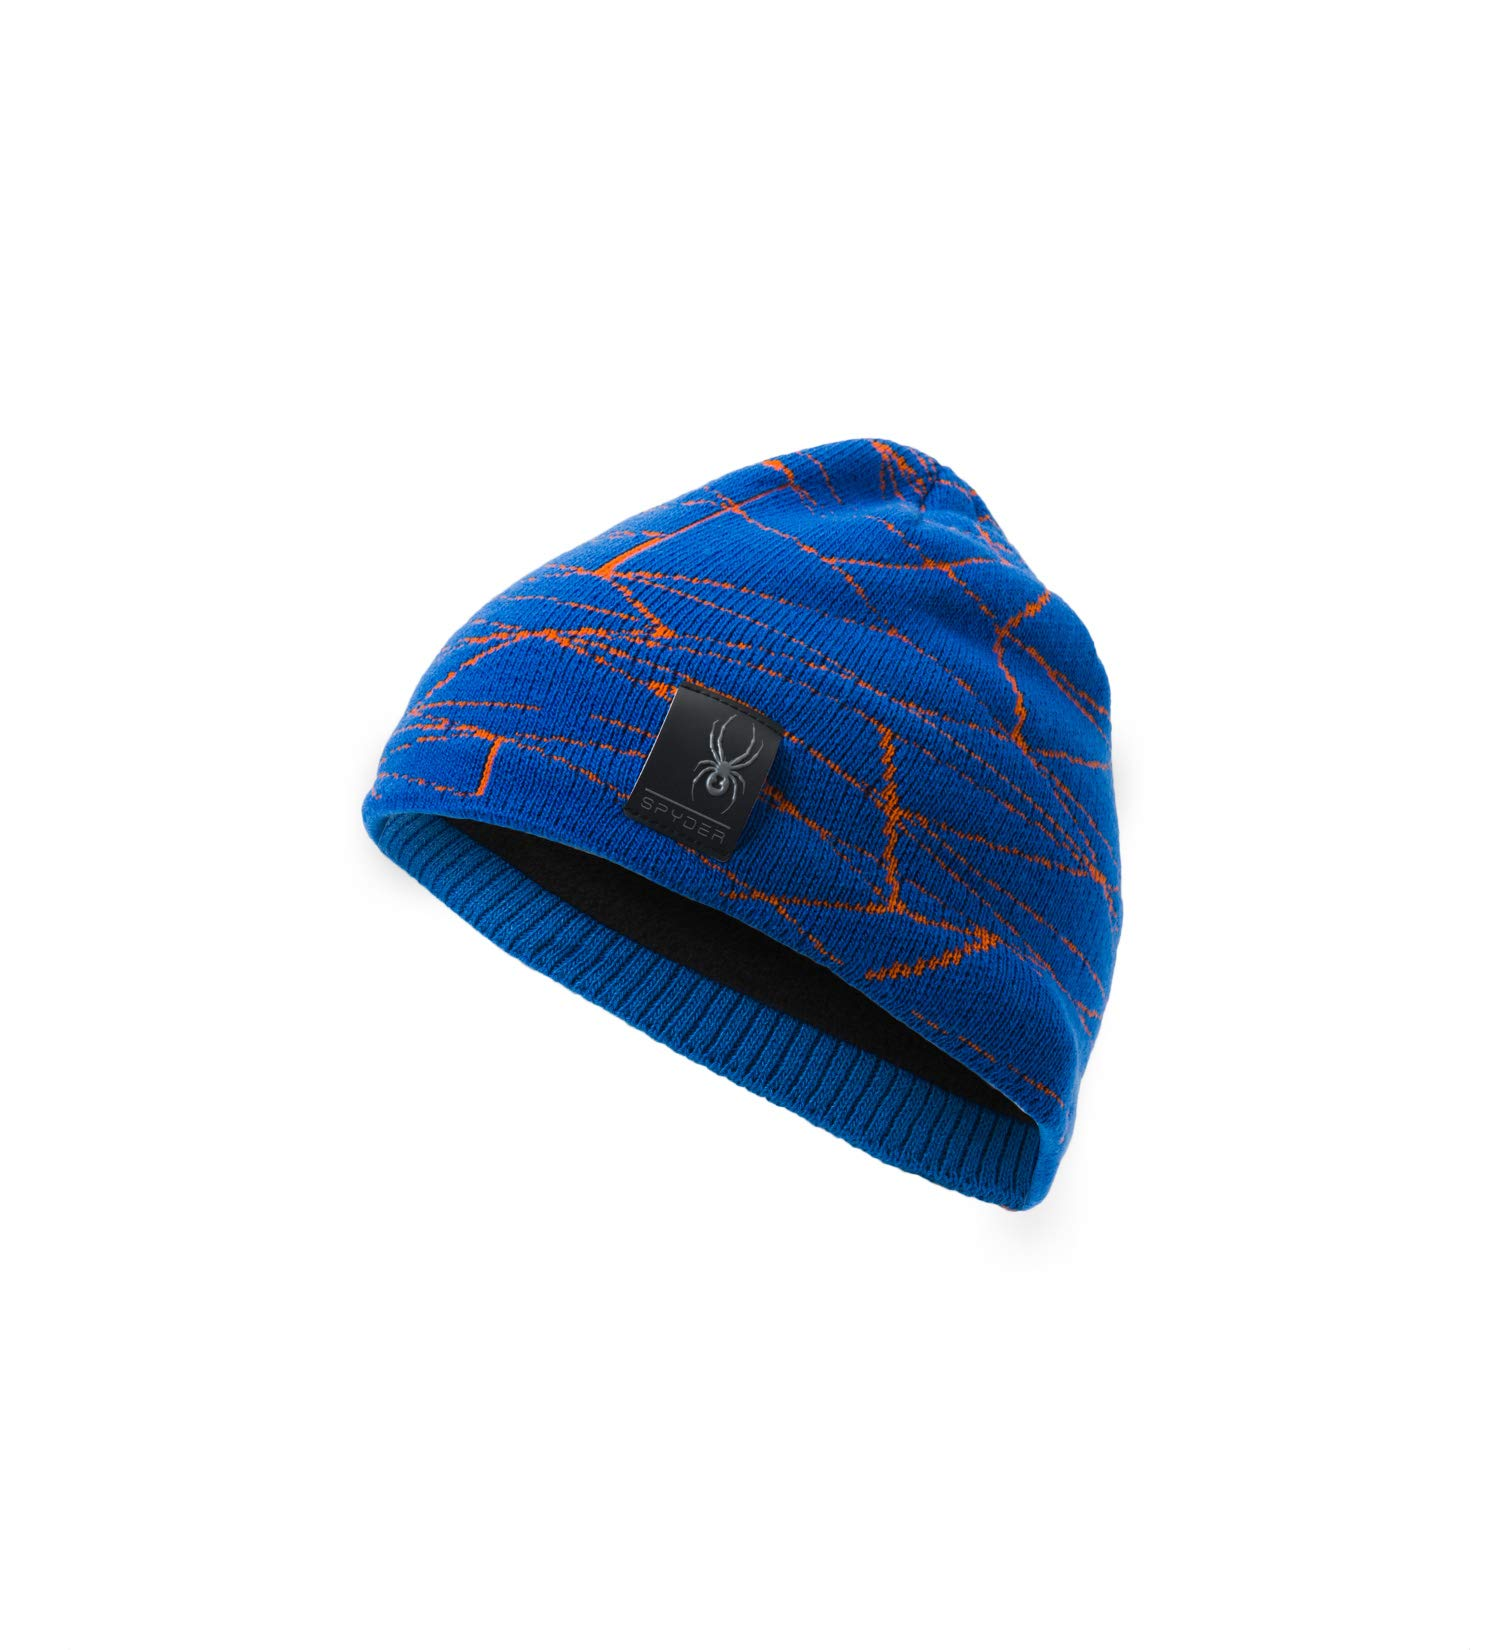 Spyder Boys' Web Hat, Turkish Sea/Exuberance/Black, One Size